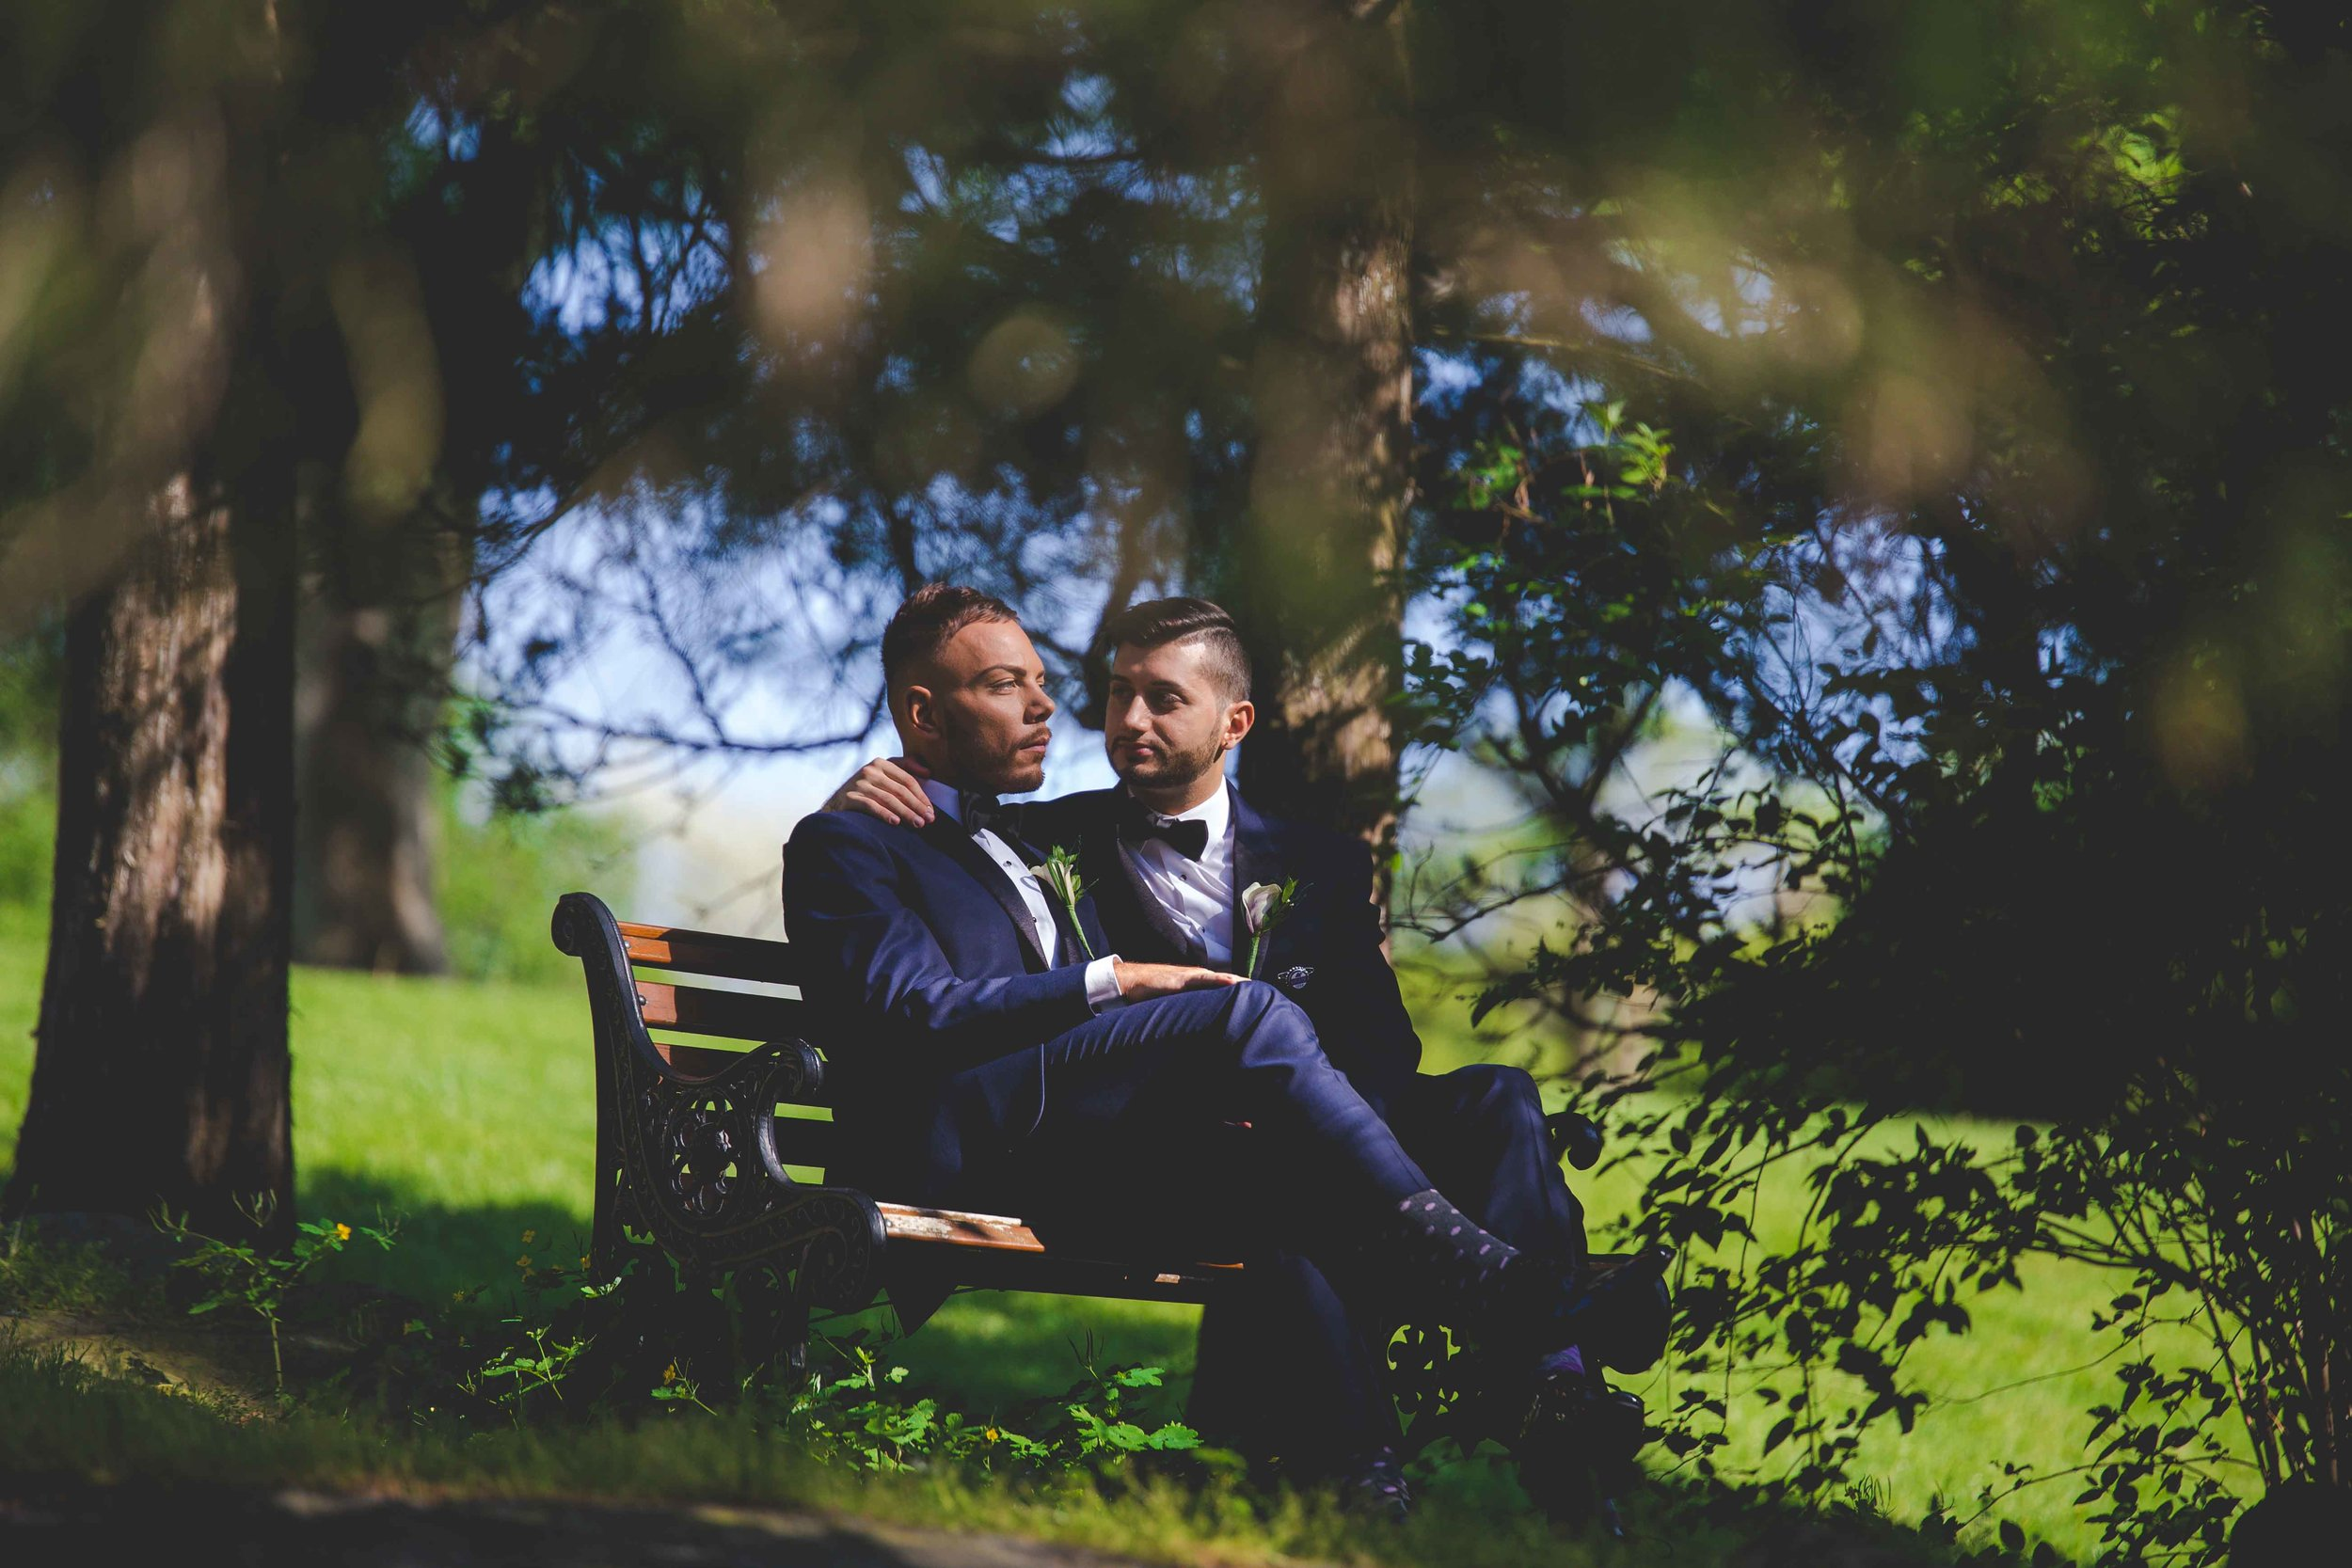 lyndhurst-mansion-amazing-gay-wedding-19.jpg